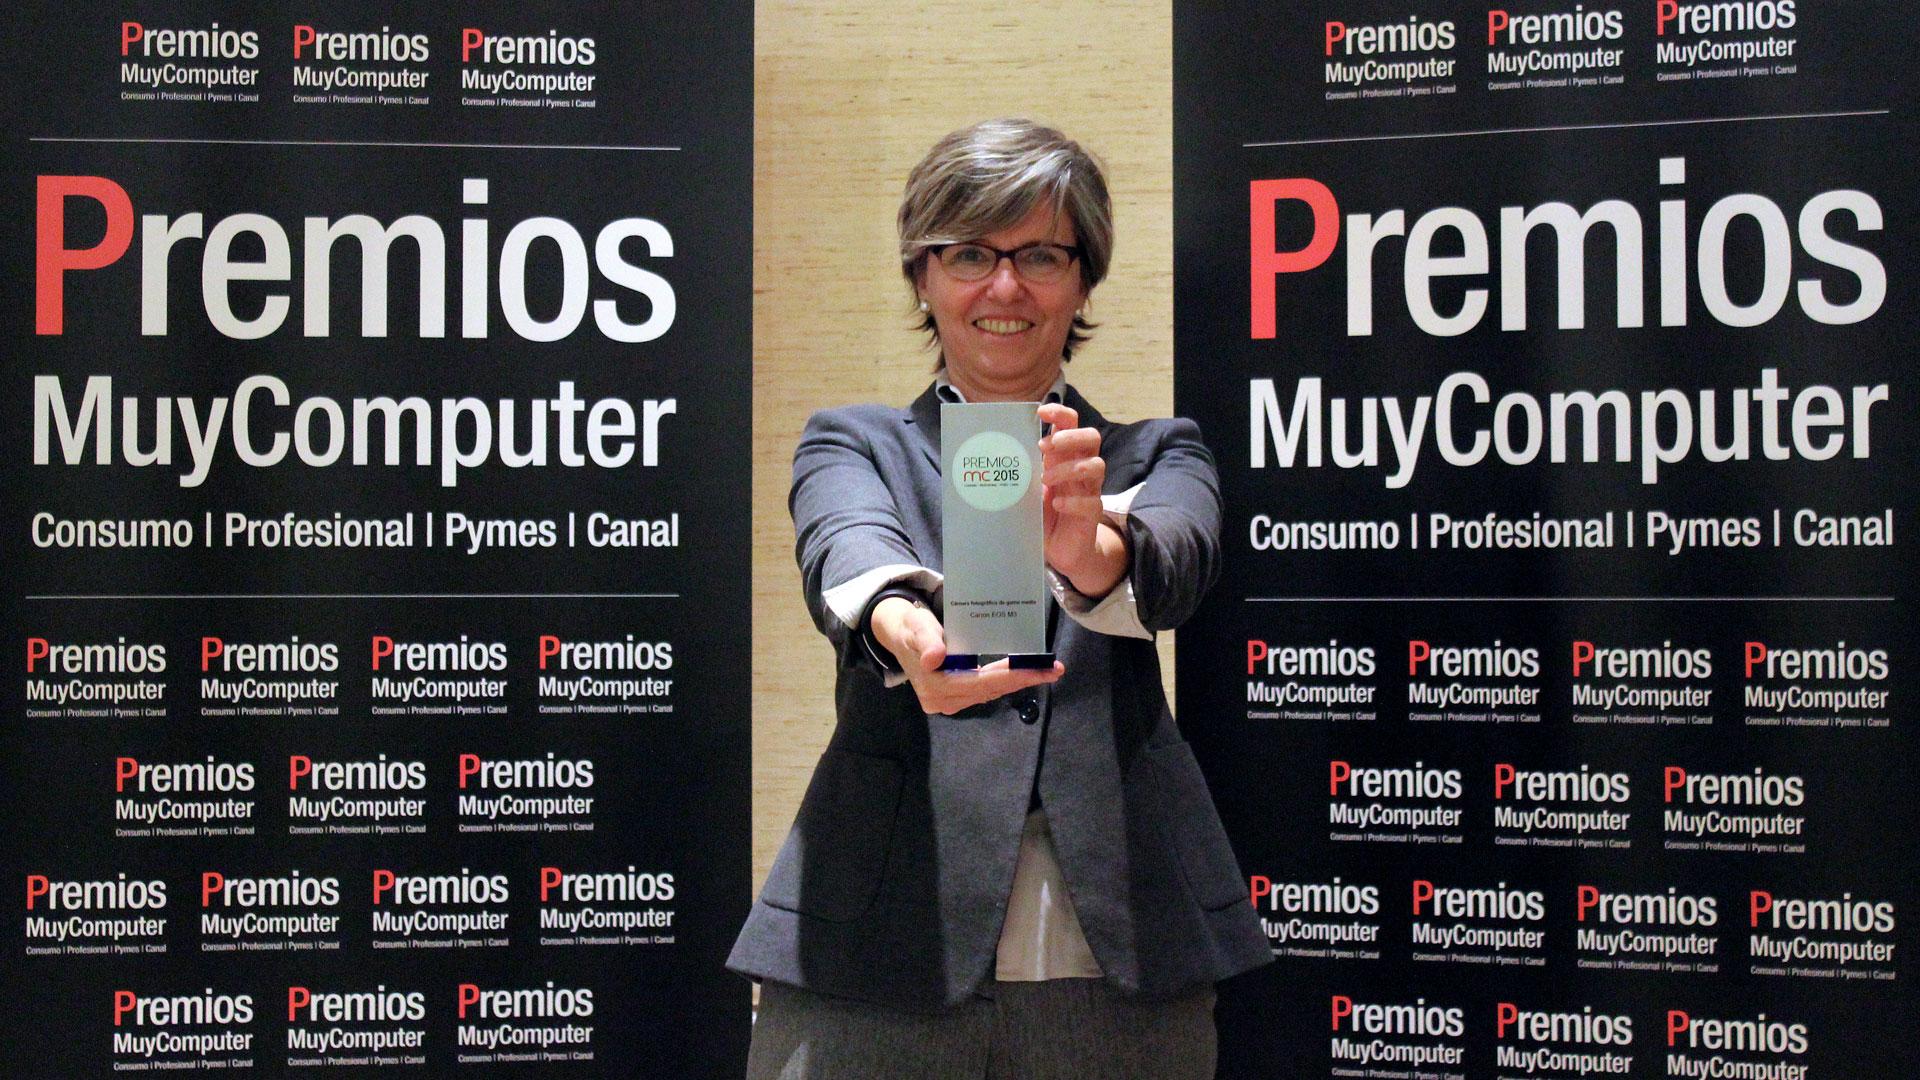 premios-mc2015-canon-eos-m3-camara-fotografica-gama-media